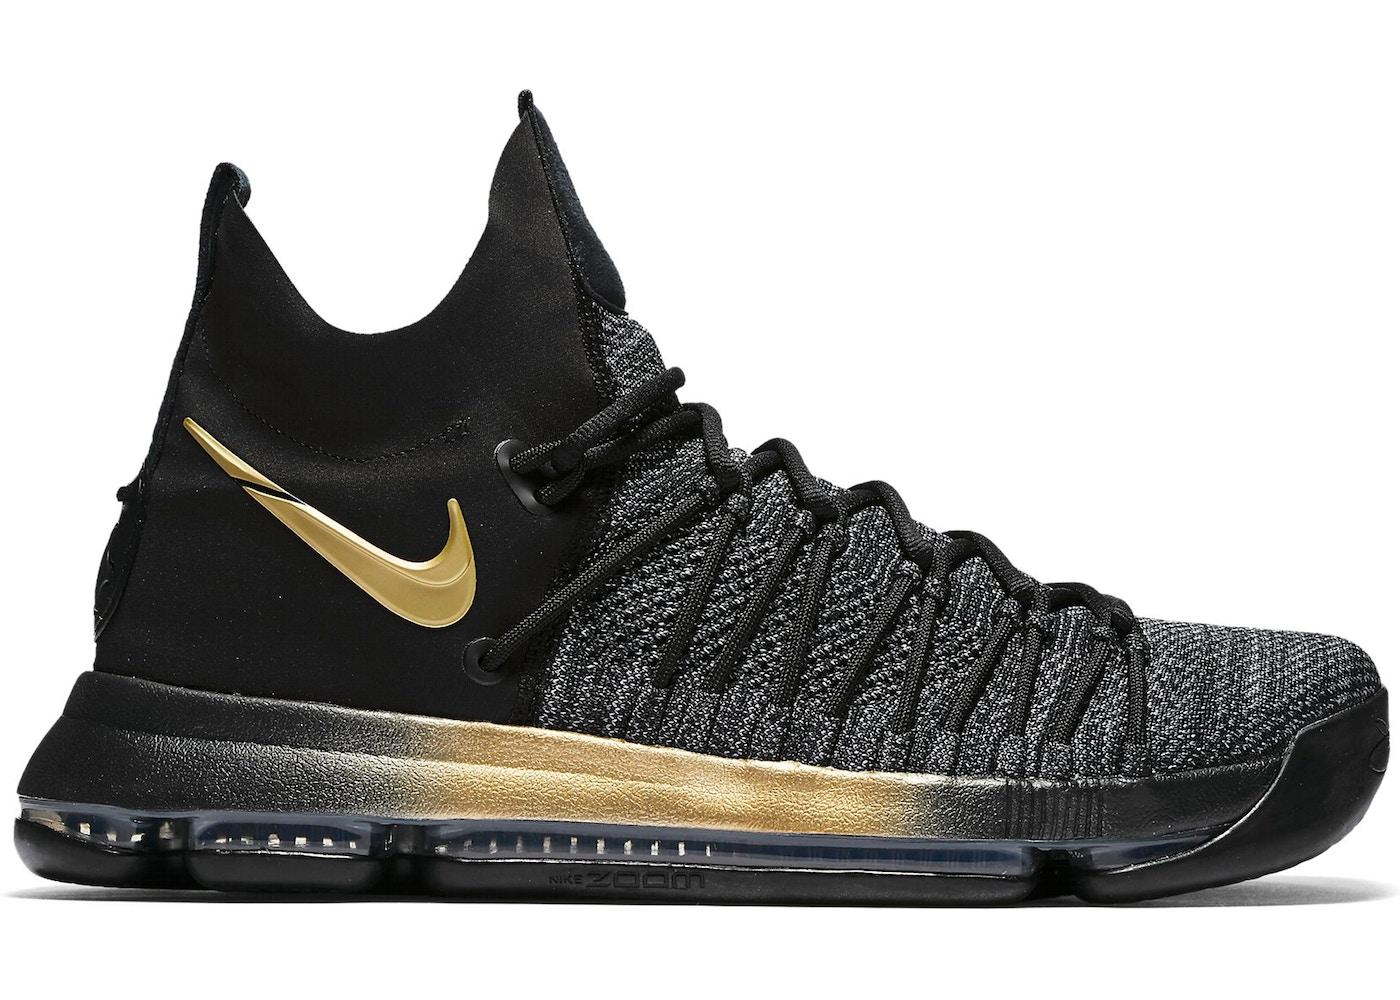 new product 50b93 10e09 Nike KD 9 Shoes - Price Premium